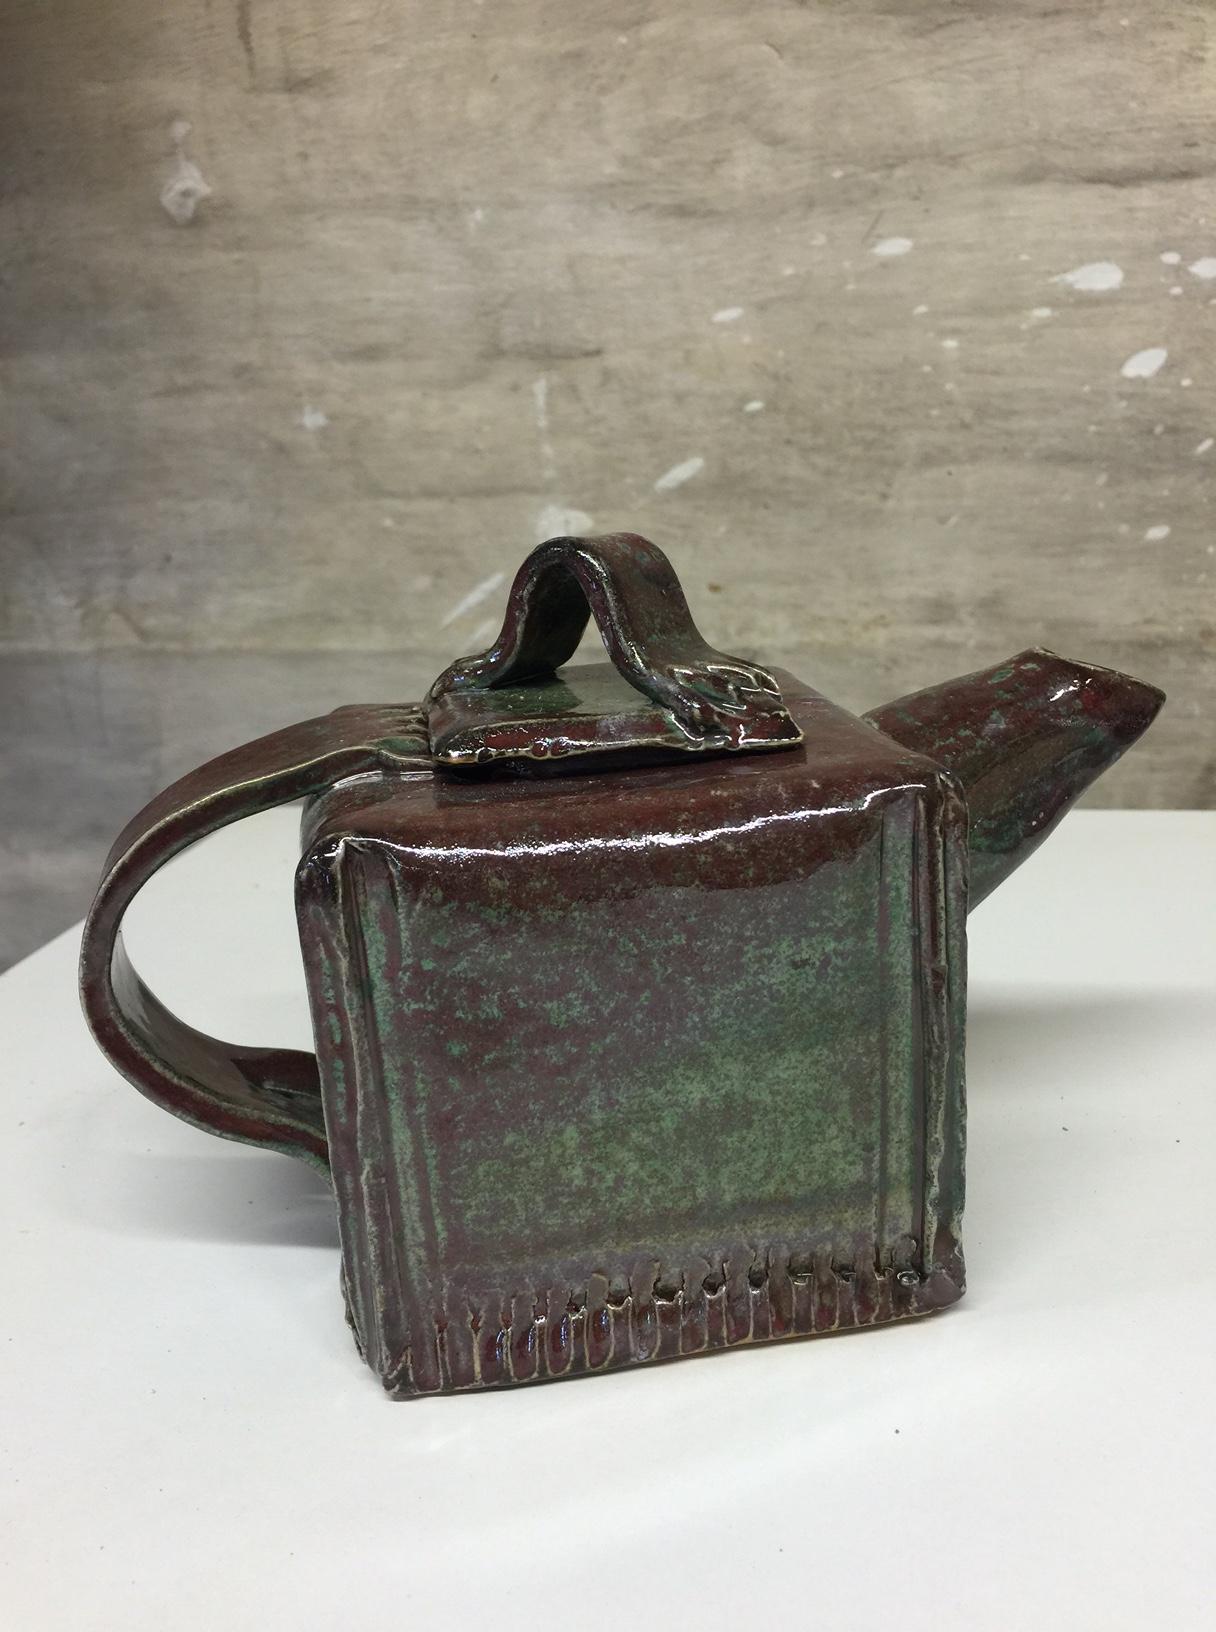 Alison's Teapot – A Happy Accident!